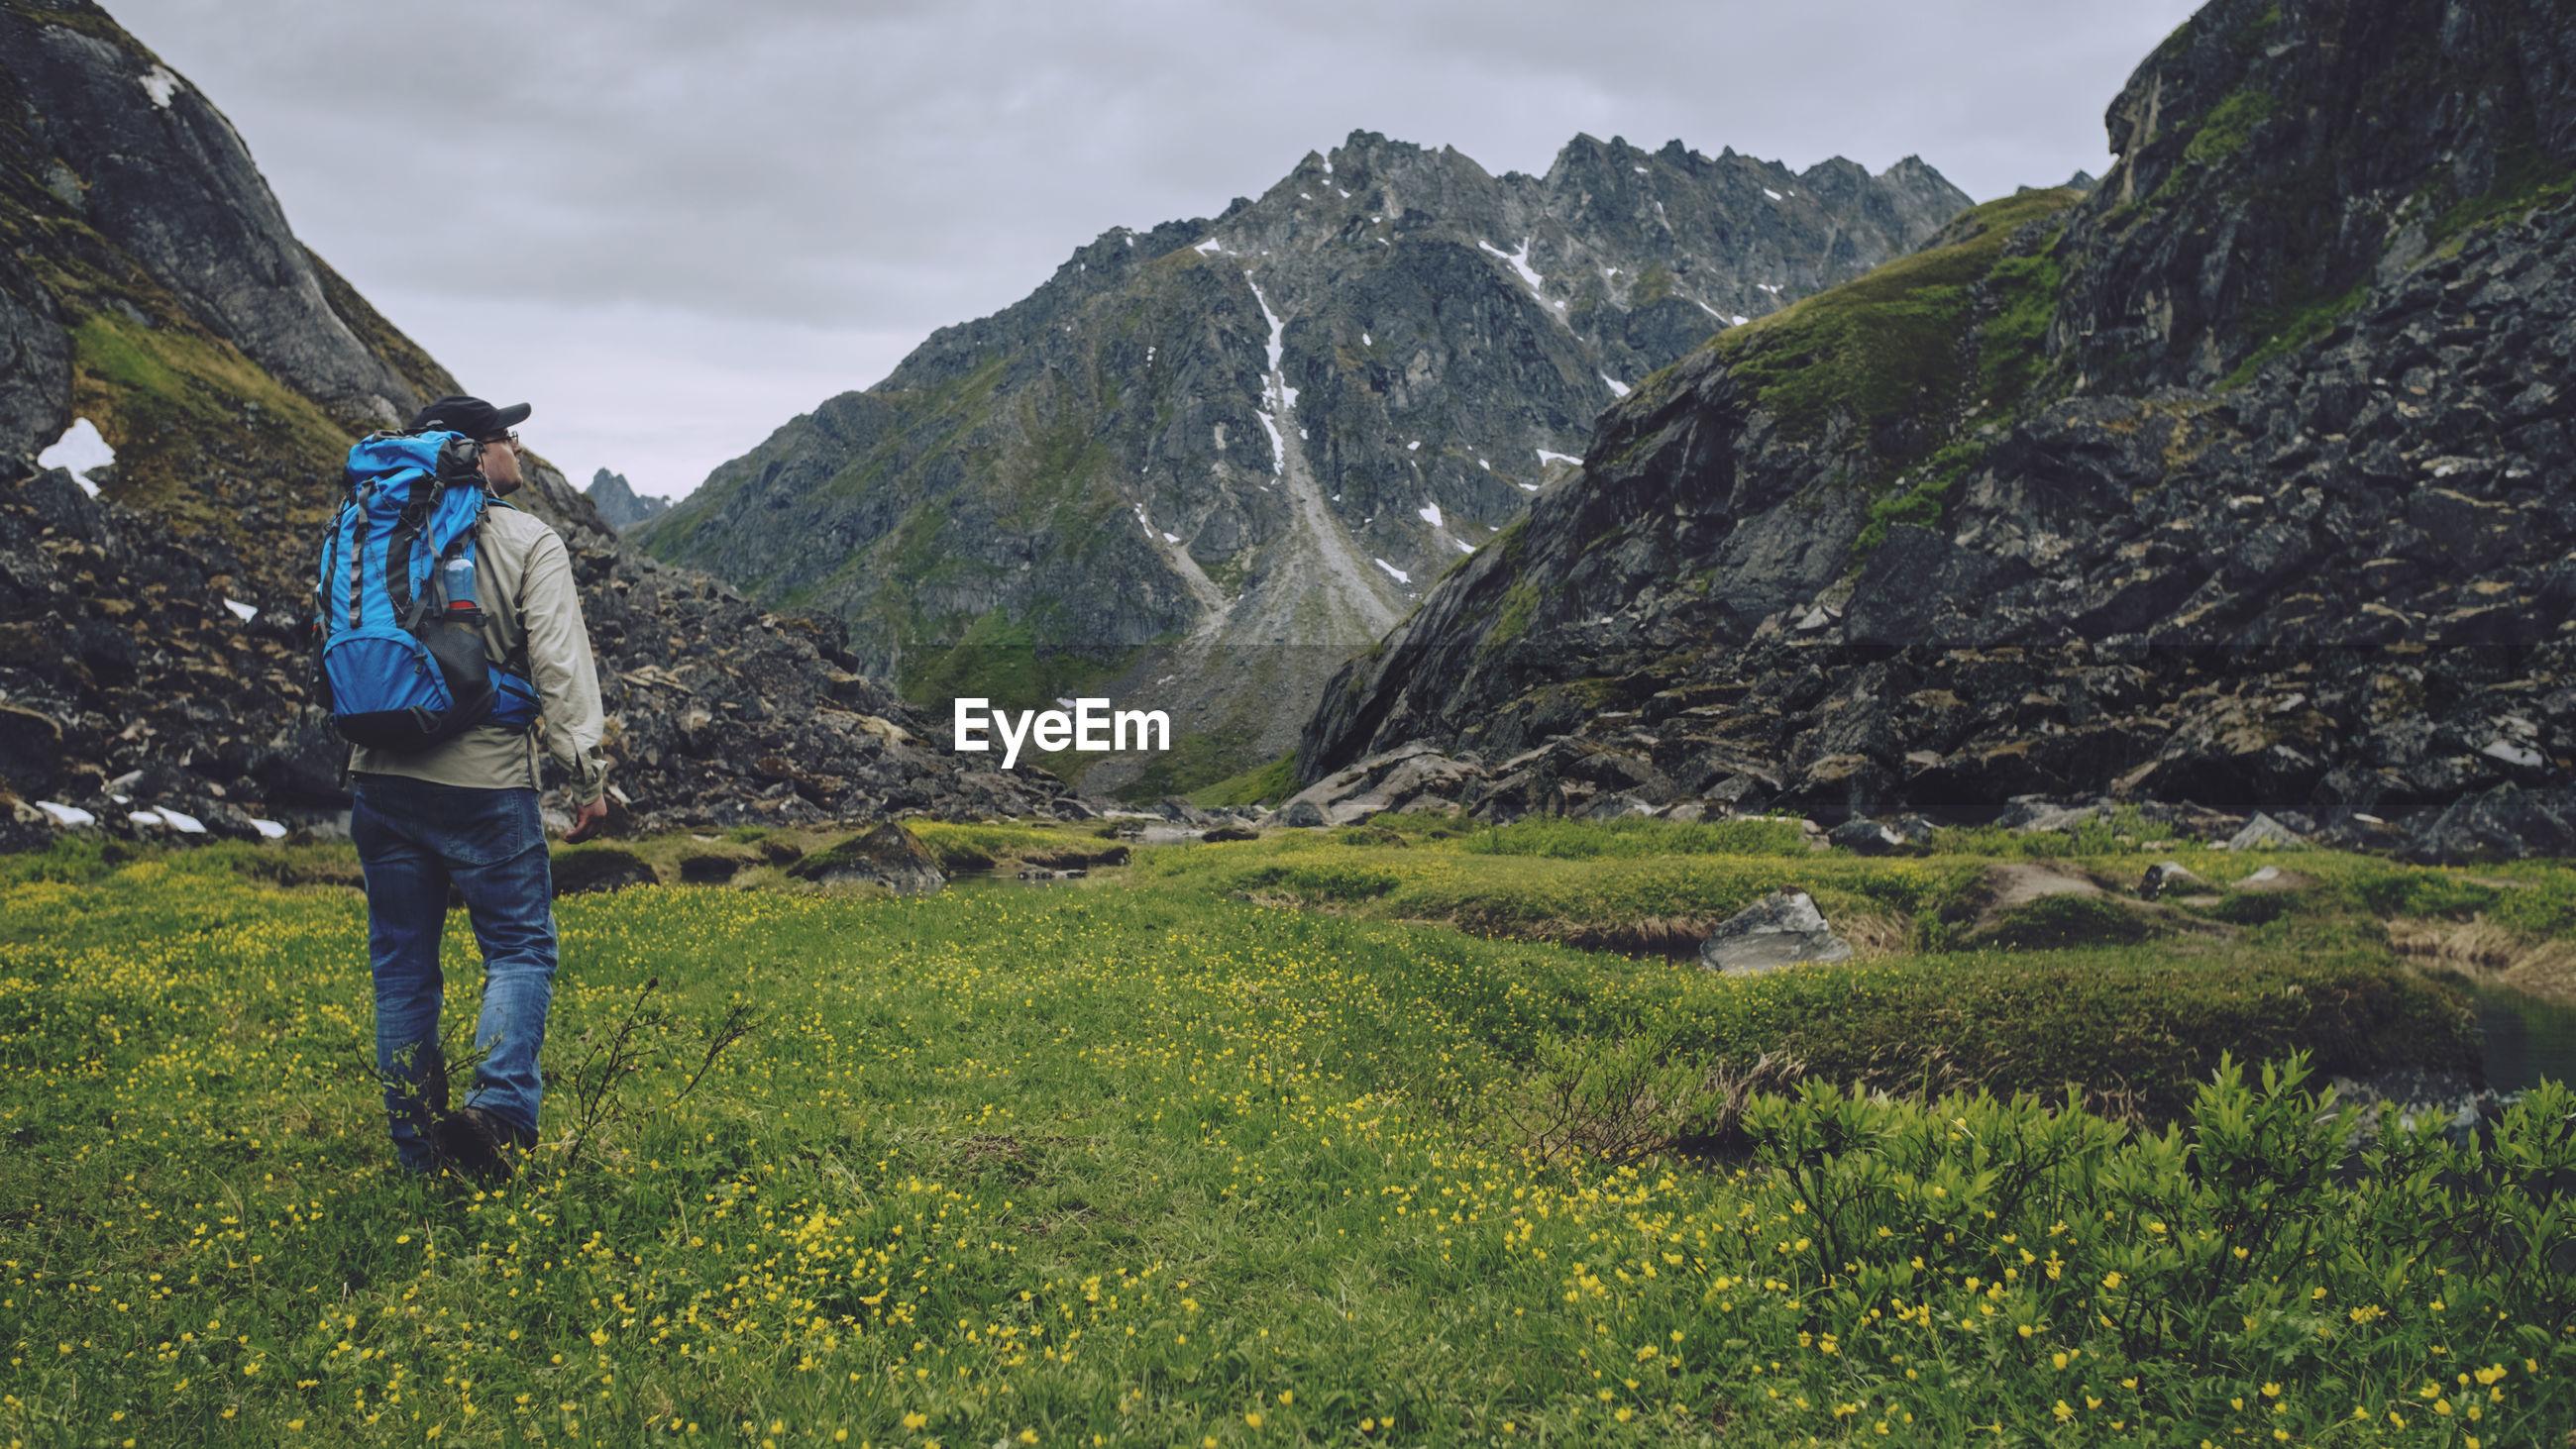 Rear view of male hiker walking on field against mountains